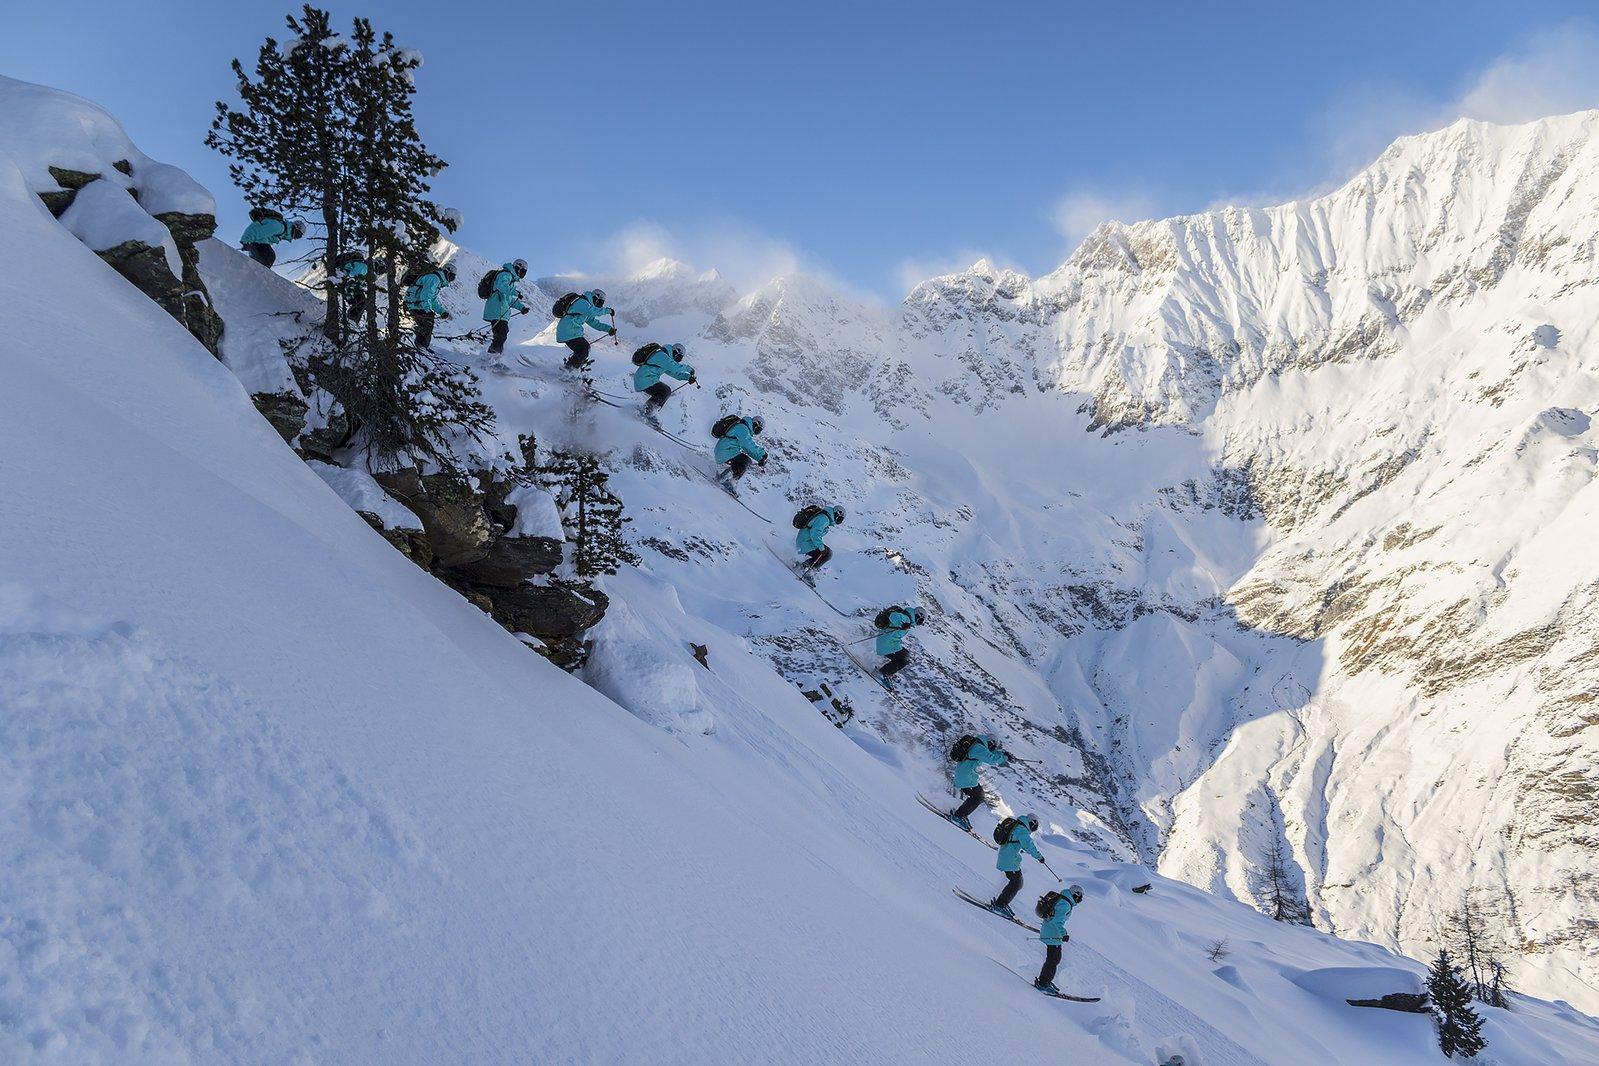 Cliffdrop in Italy